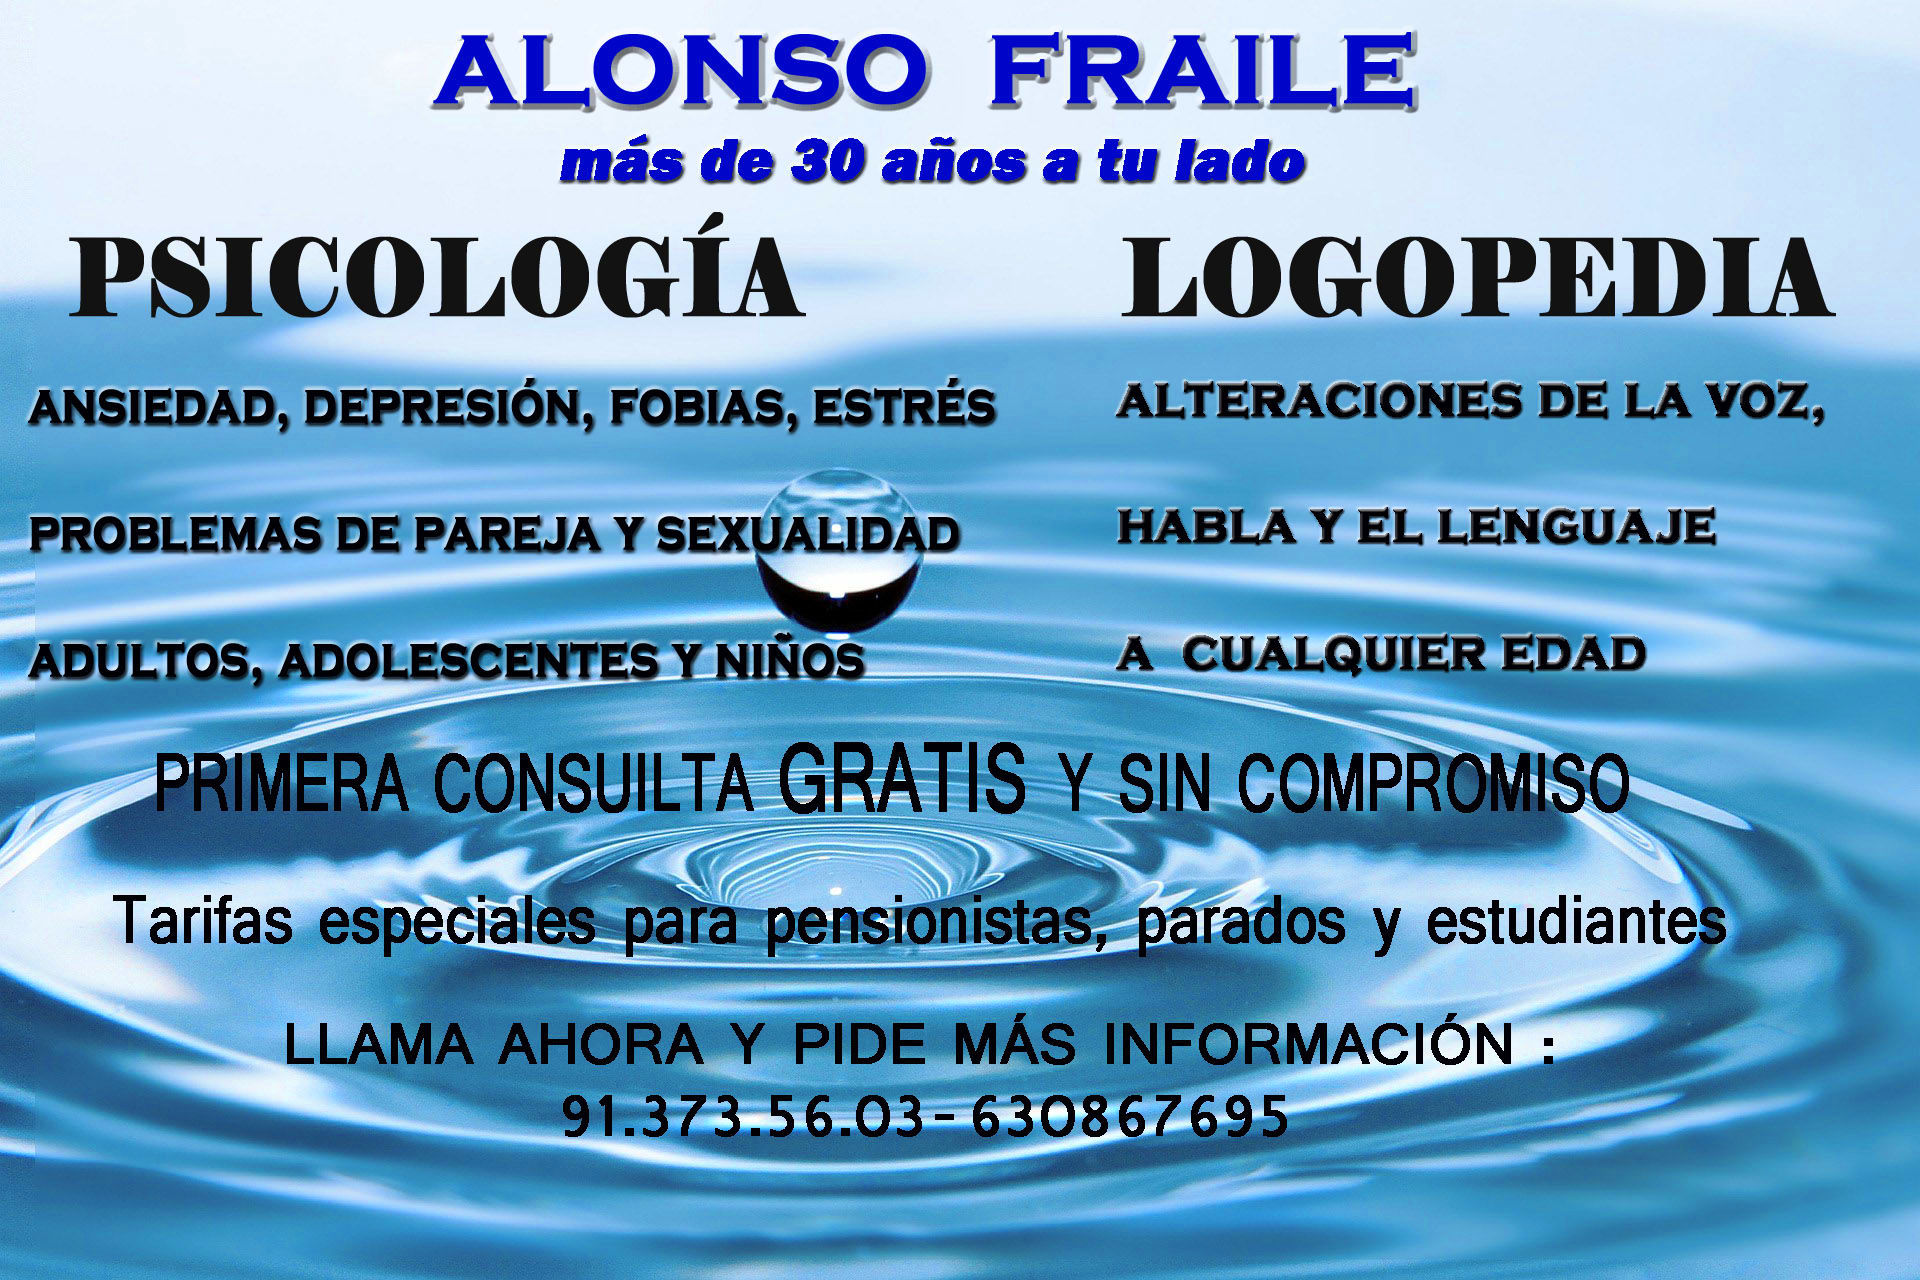 psicología logopedia madrid